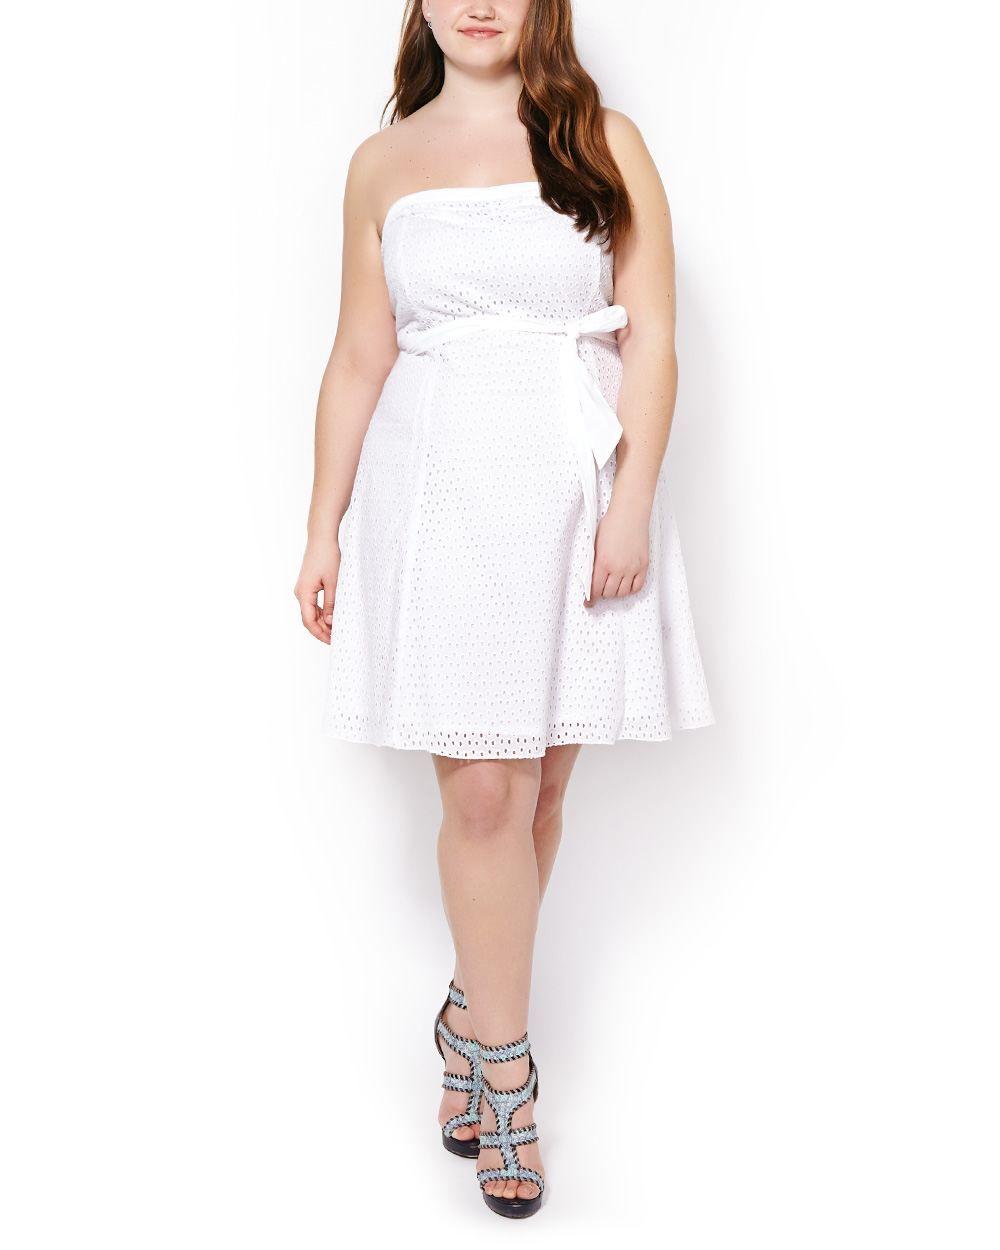 Cotton Eyelet Lace Dress with Removable Straps #plussizefashion #penningtons